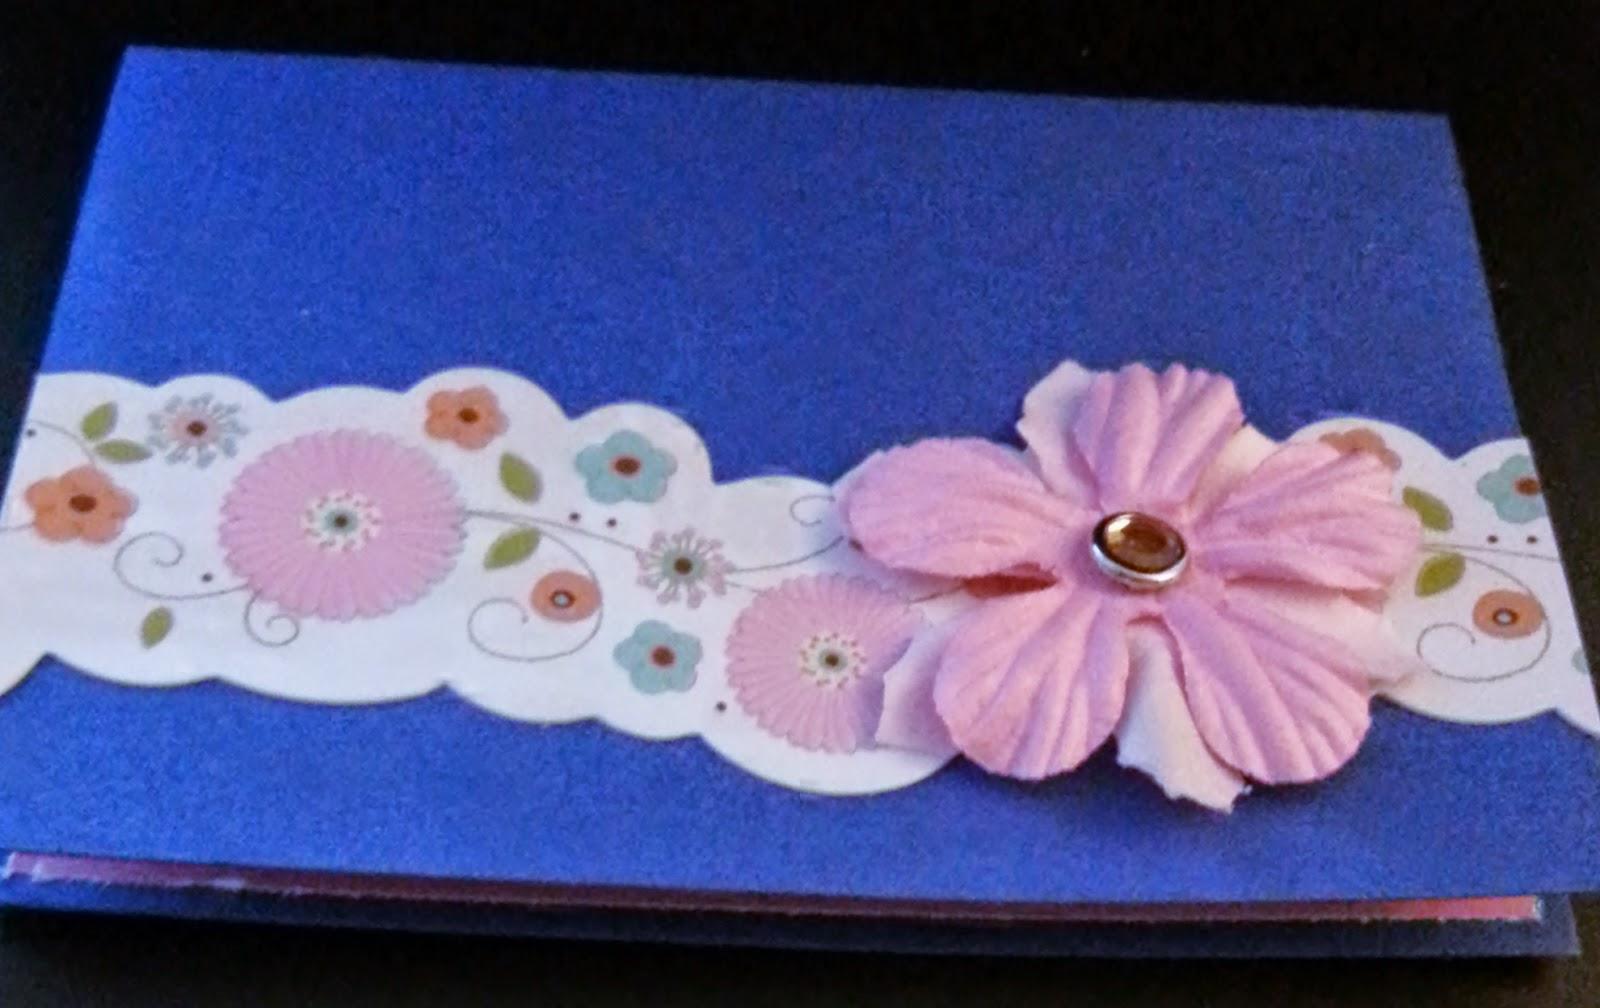 https://www.etsy.com/listing/197075013/birthday-wishes-floral-handmade-greeting